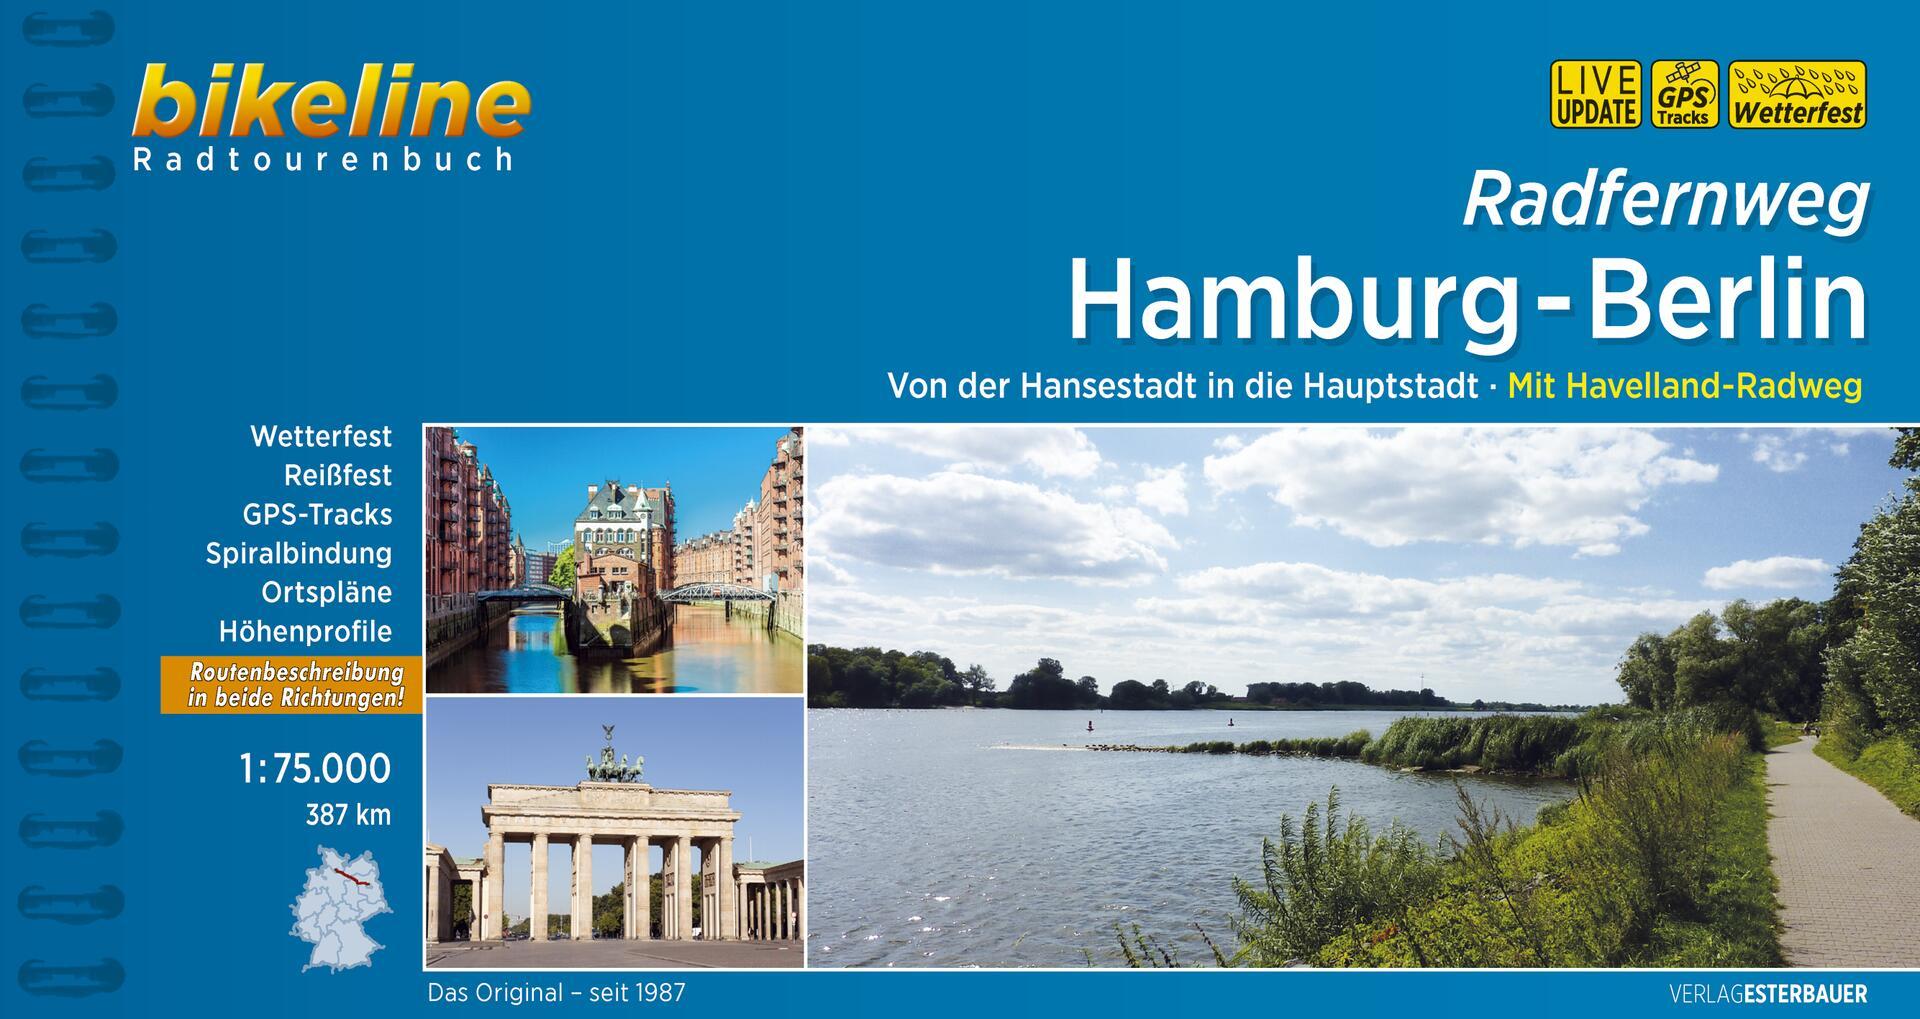 Foto vom Radfernweg Hamburg-Berlin